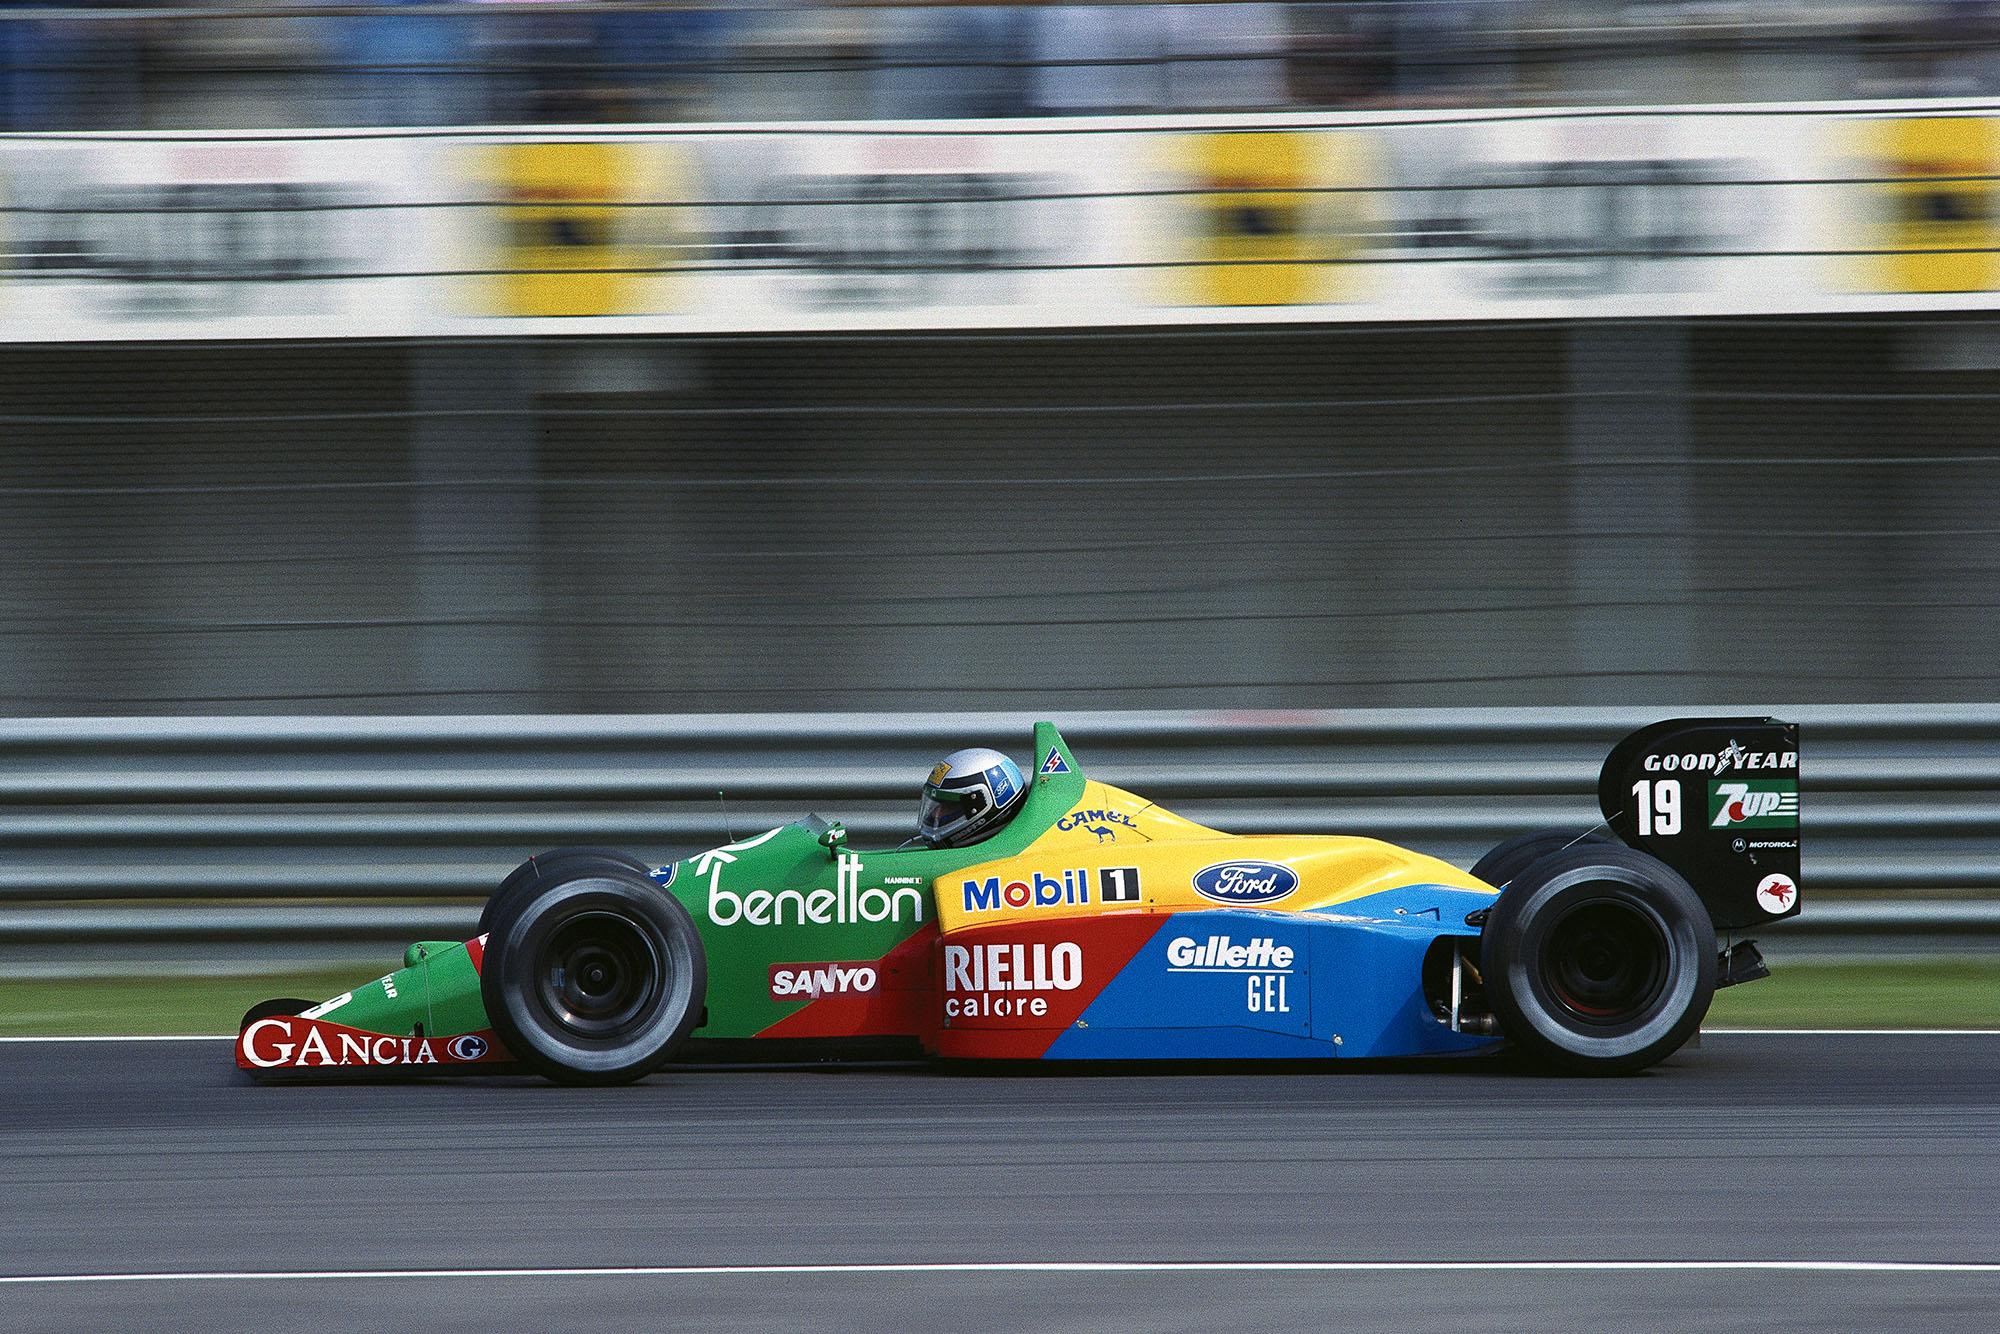 1989 Monaco GP Nannini 3rd